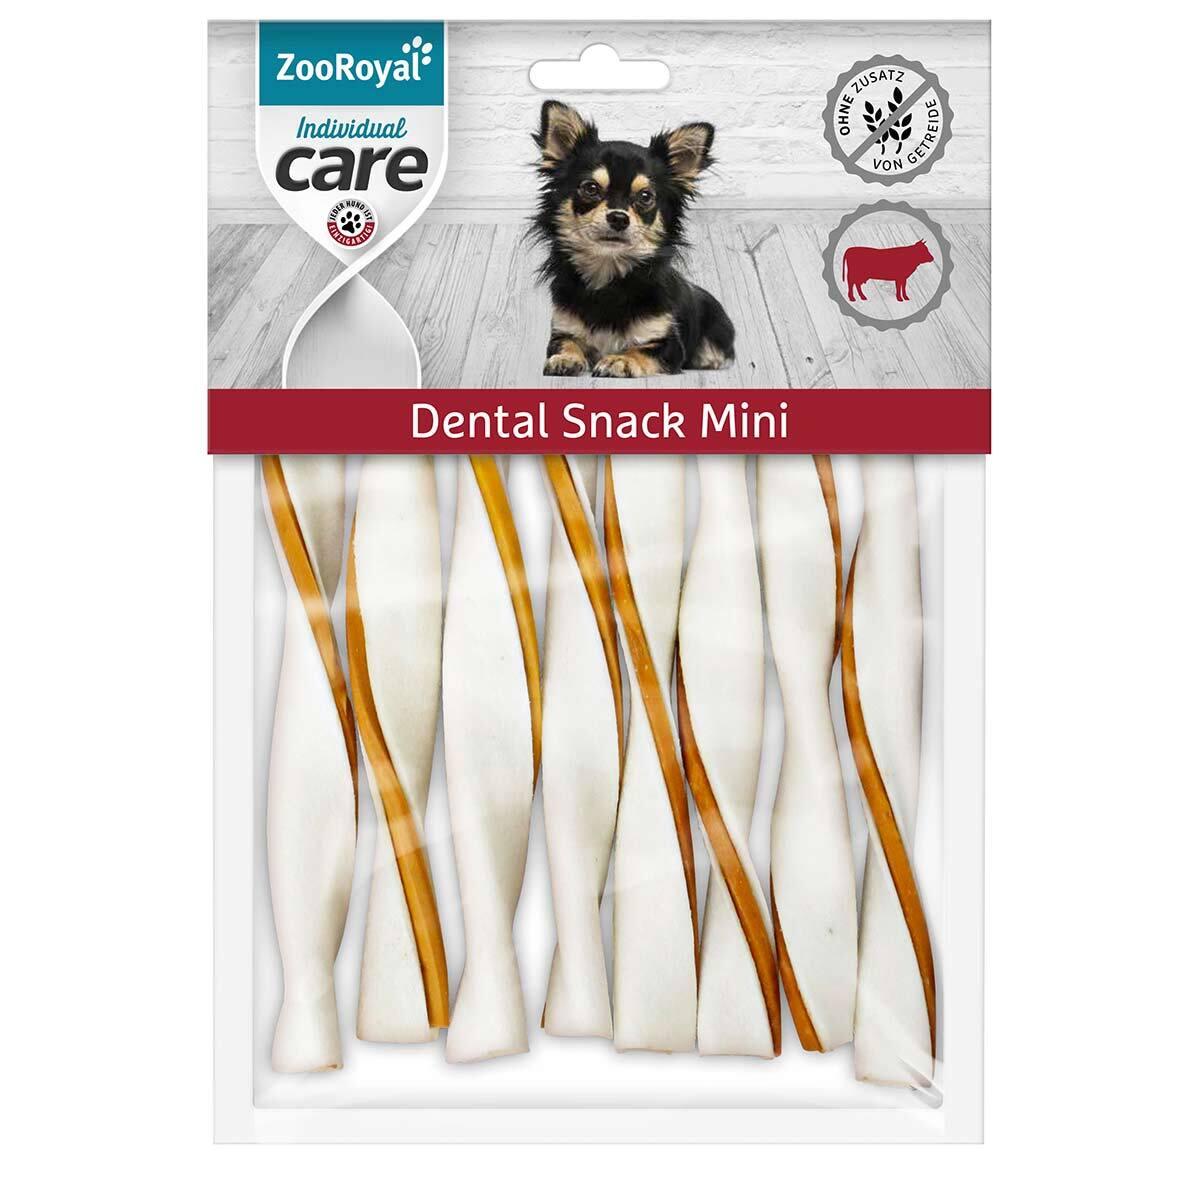 Bild 1 von ZooRoyal Individual care Dental Snack Mini 3x8 Stück